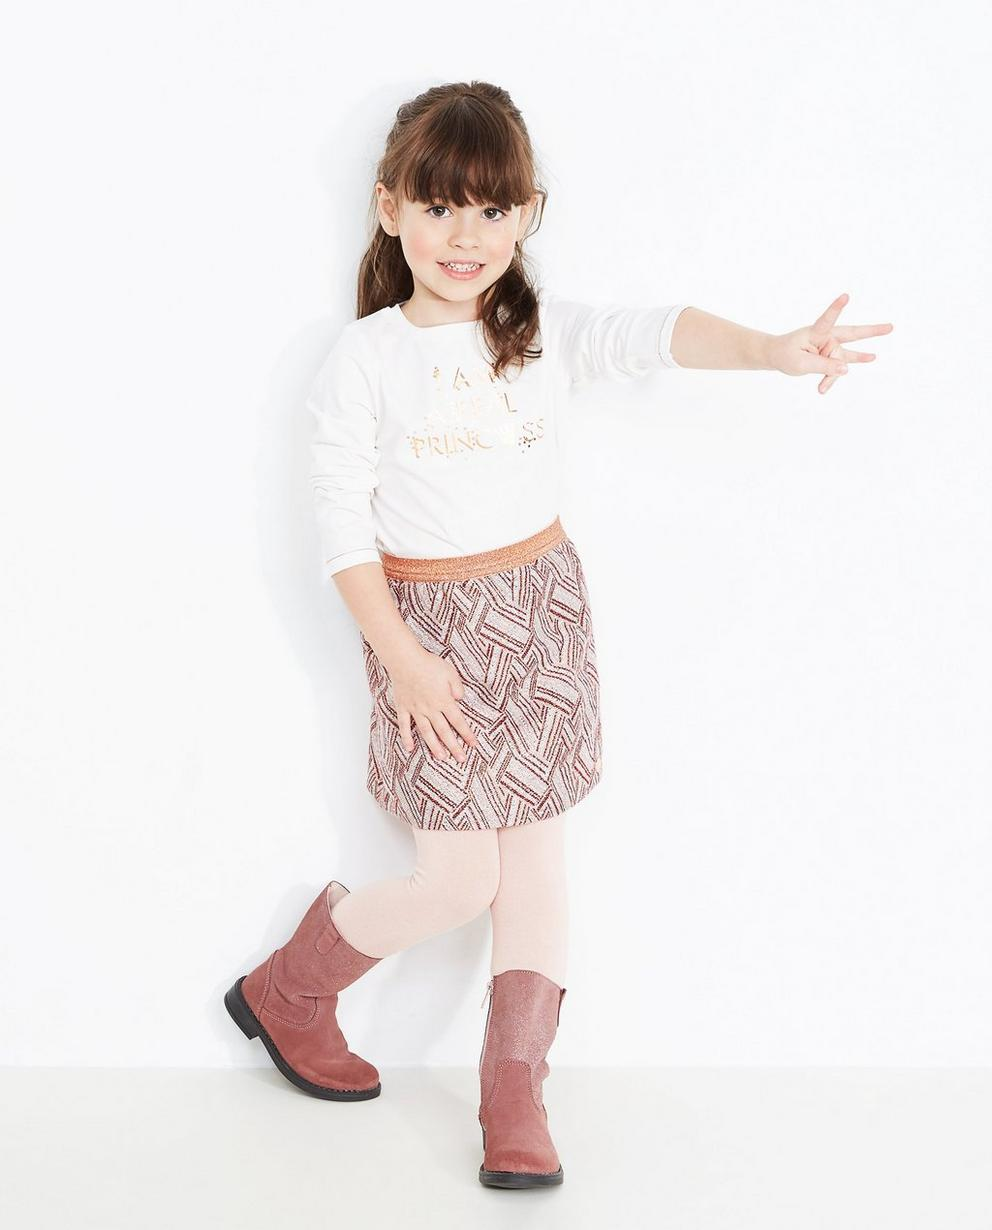 T-shirt à longues manches - à paillettes, Prinsessia - Prinsessia